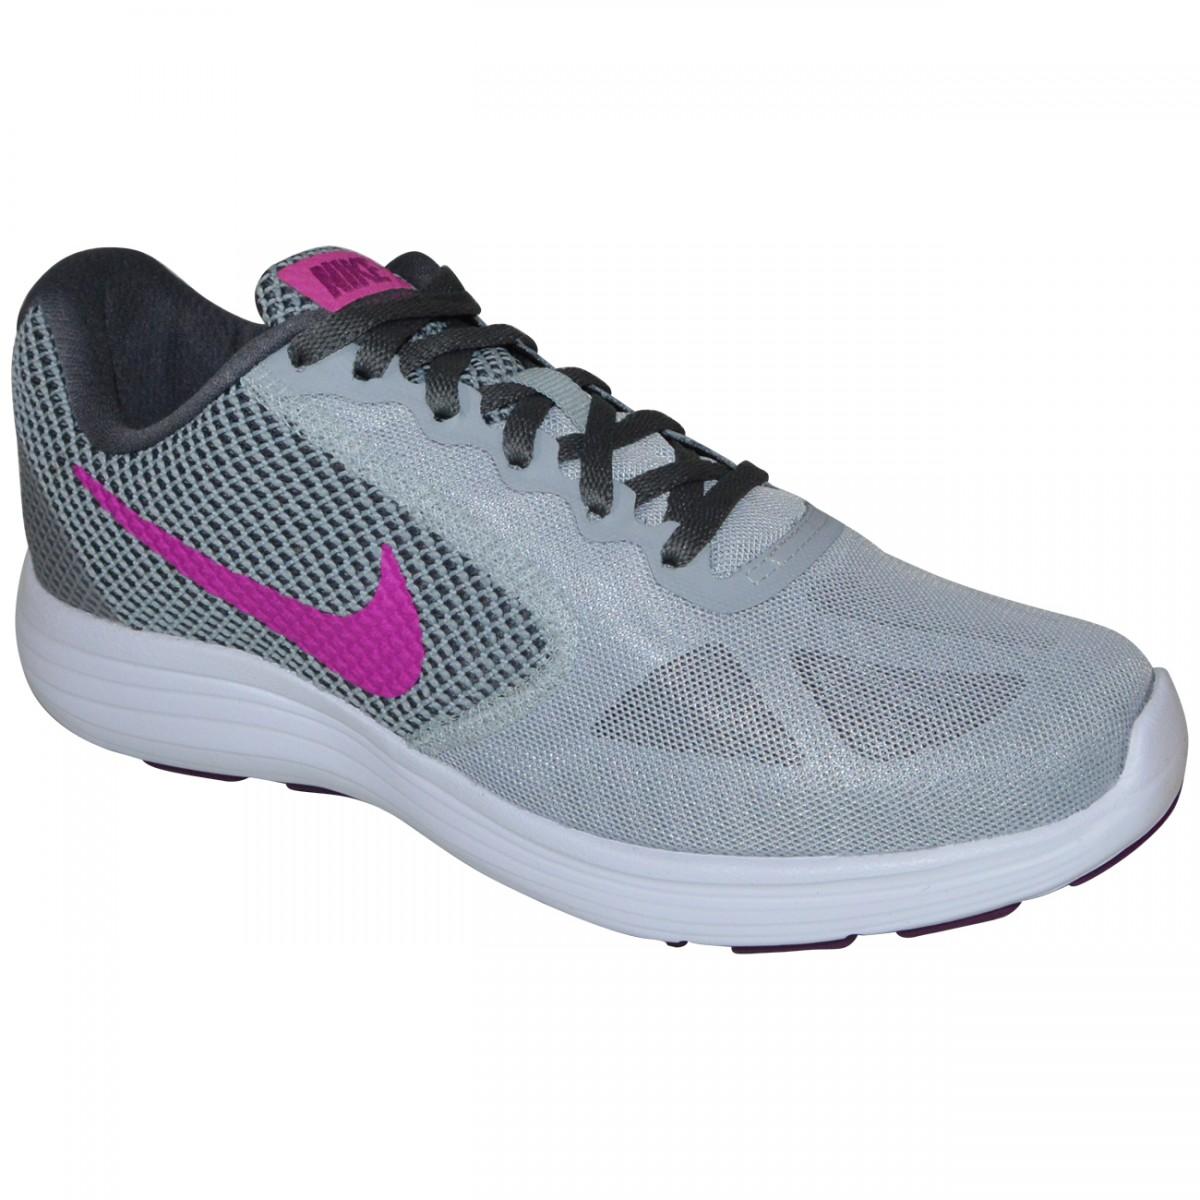 Tenis Nike Revolution 3 819303 009 - Cinza Chumbo Pink - Chuteira Nike 6dde69ad27f59